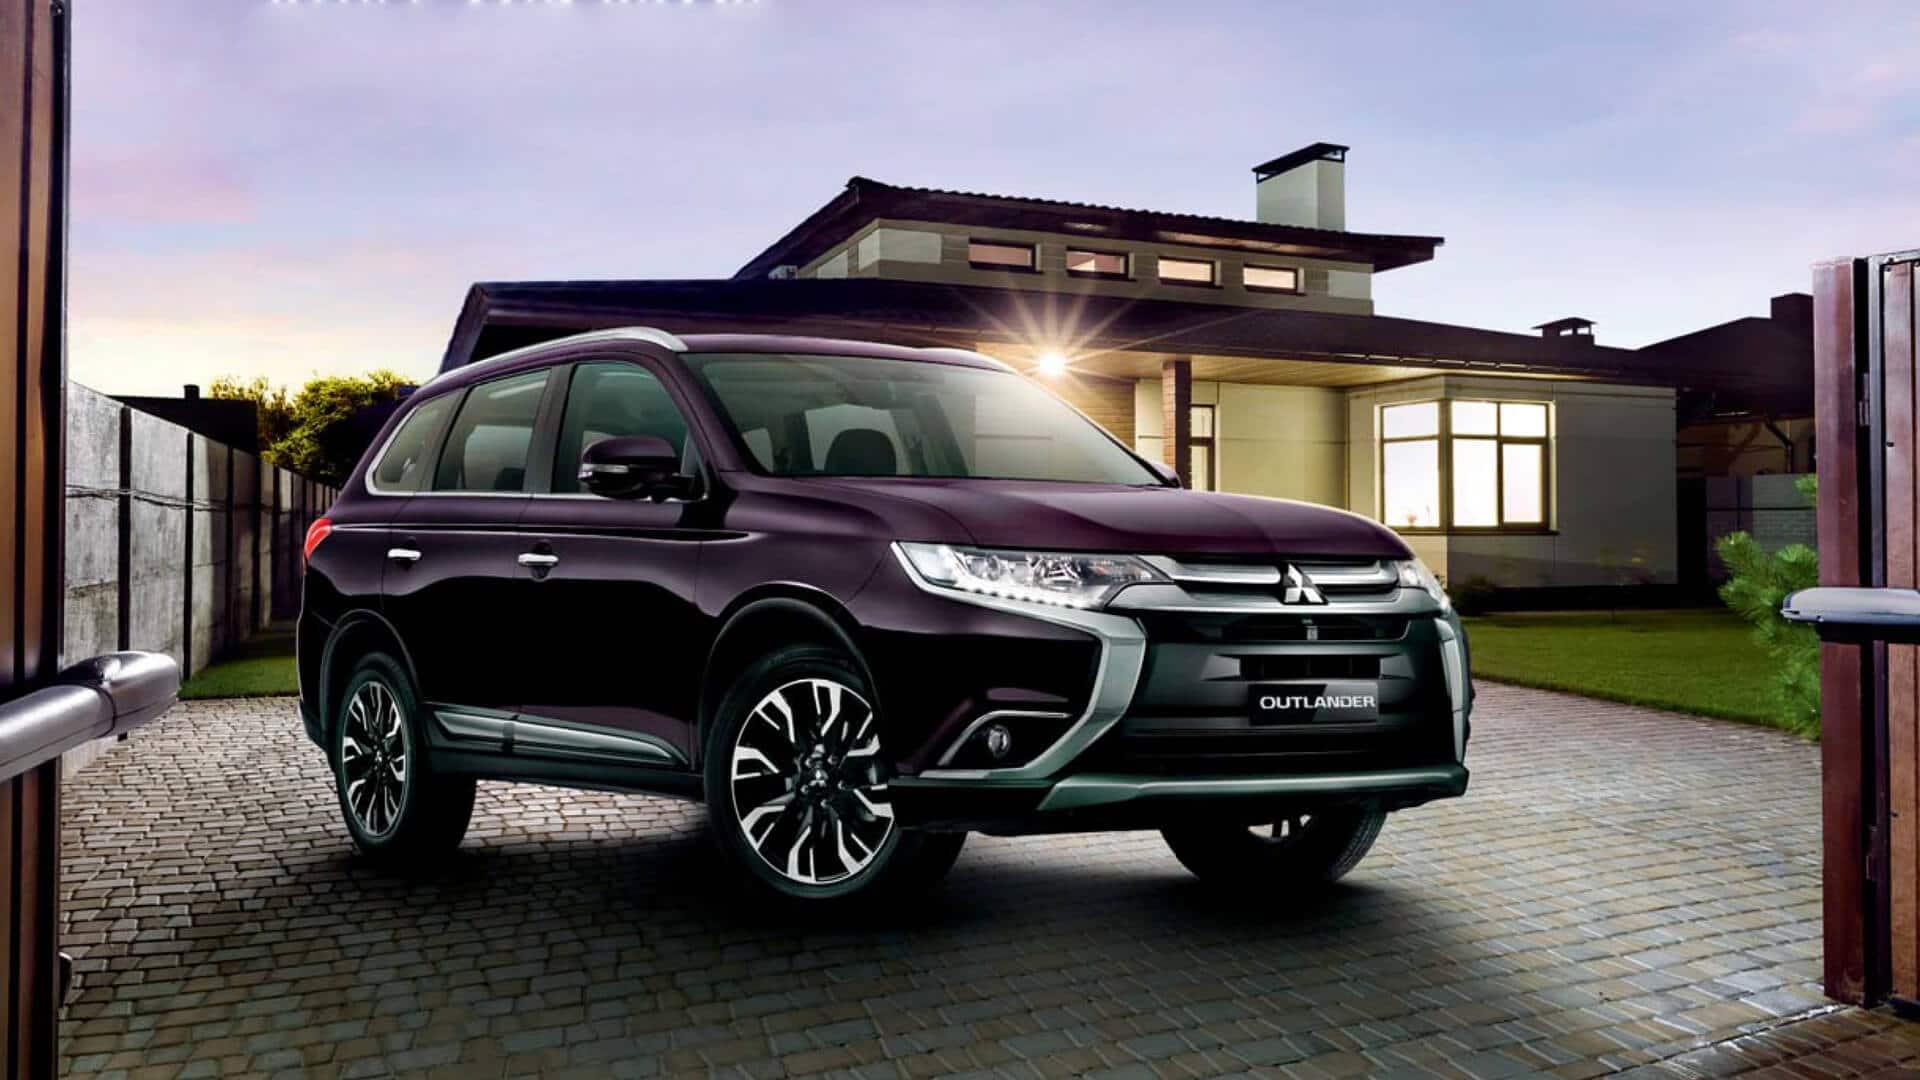 Accident Insurance Company >> Mitsubishi Outlander - 7 Seater SUV | Mitsubishi Motors ...